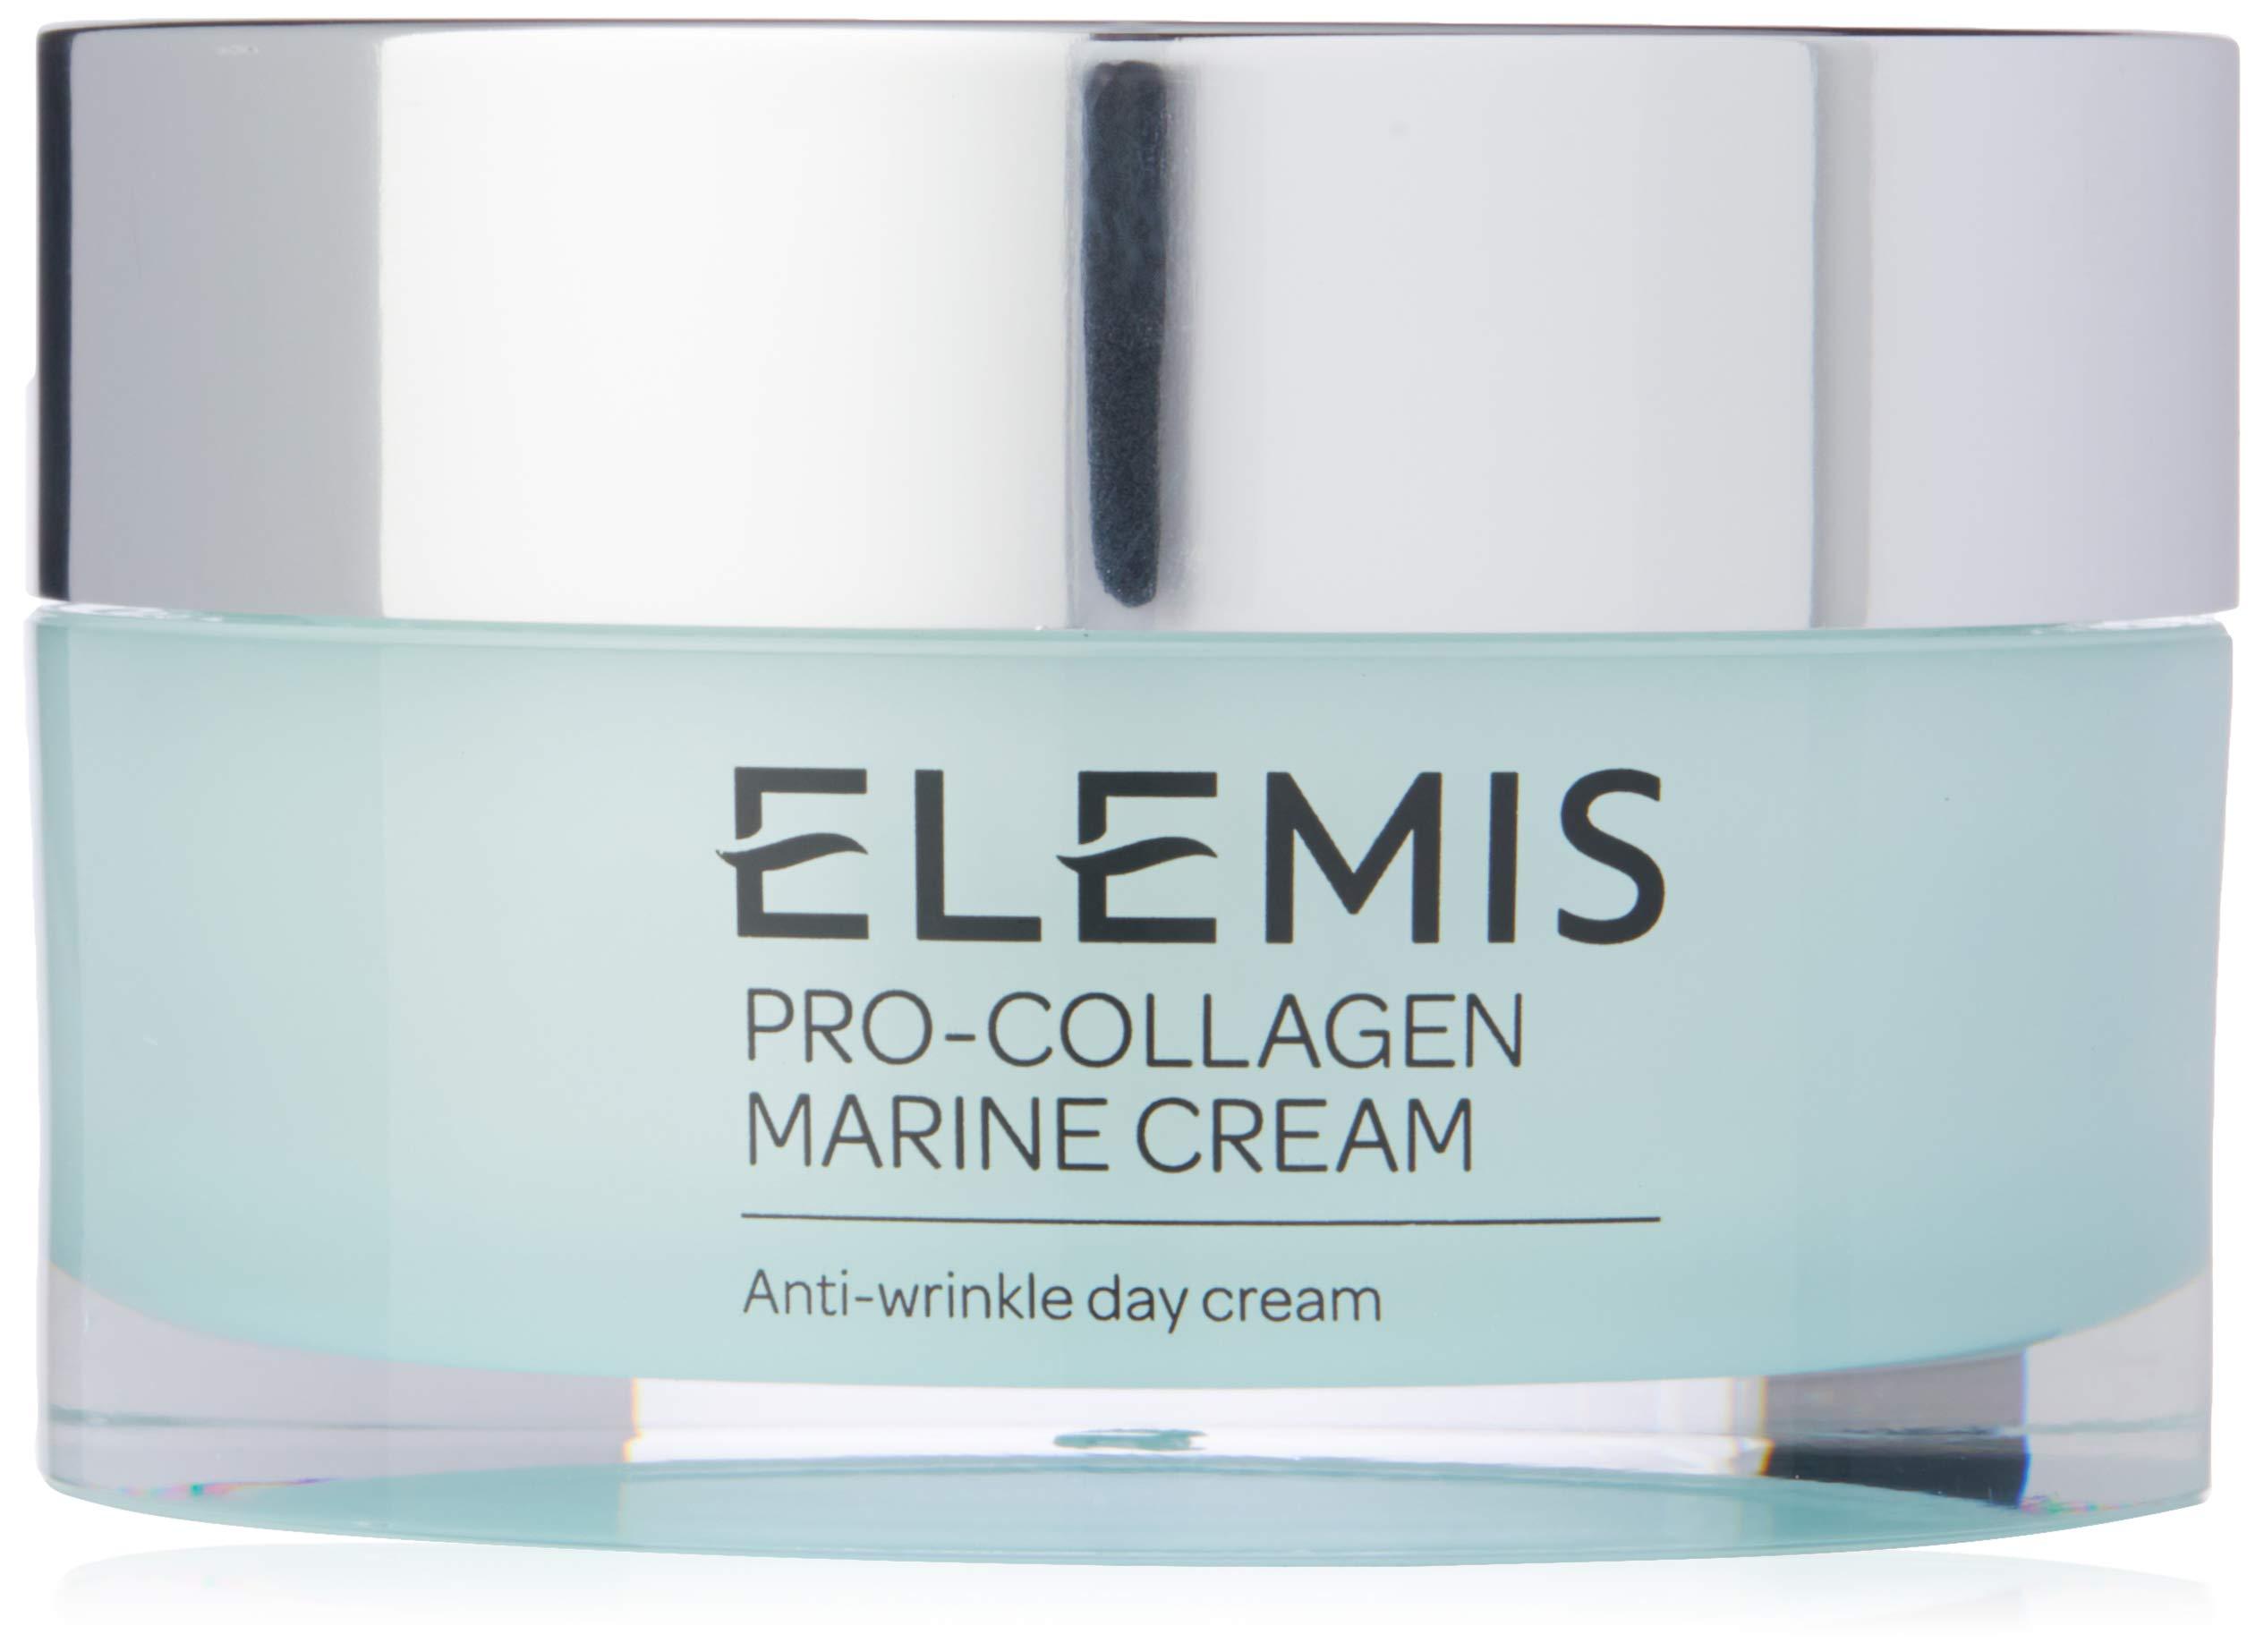 ELEMIS Pro-Collagen Marine Cream, Anti-wrinkle Day Cream, 3.3 fl. oz